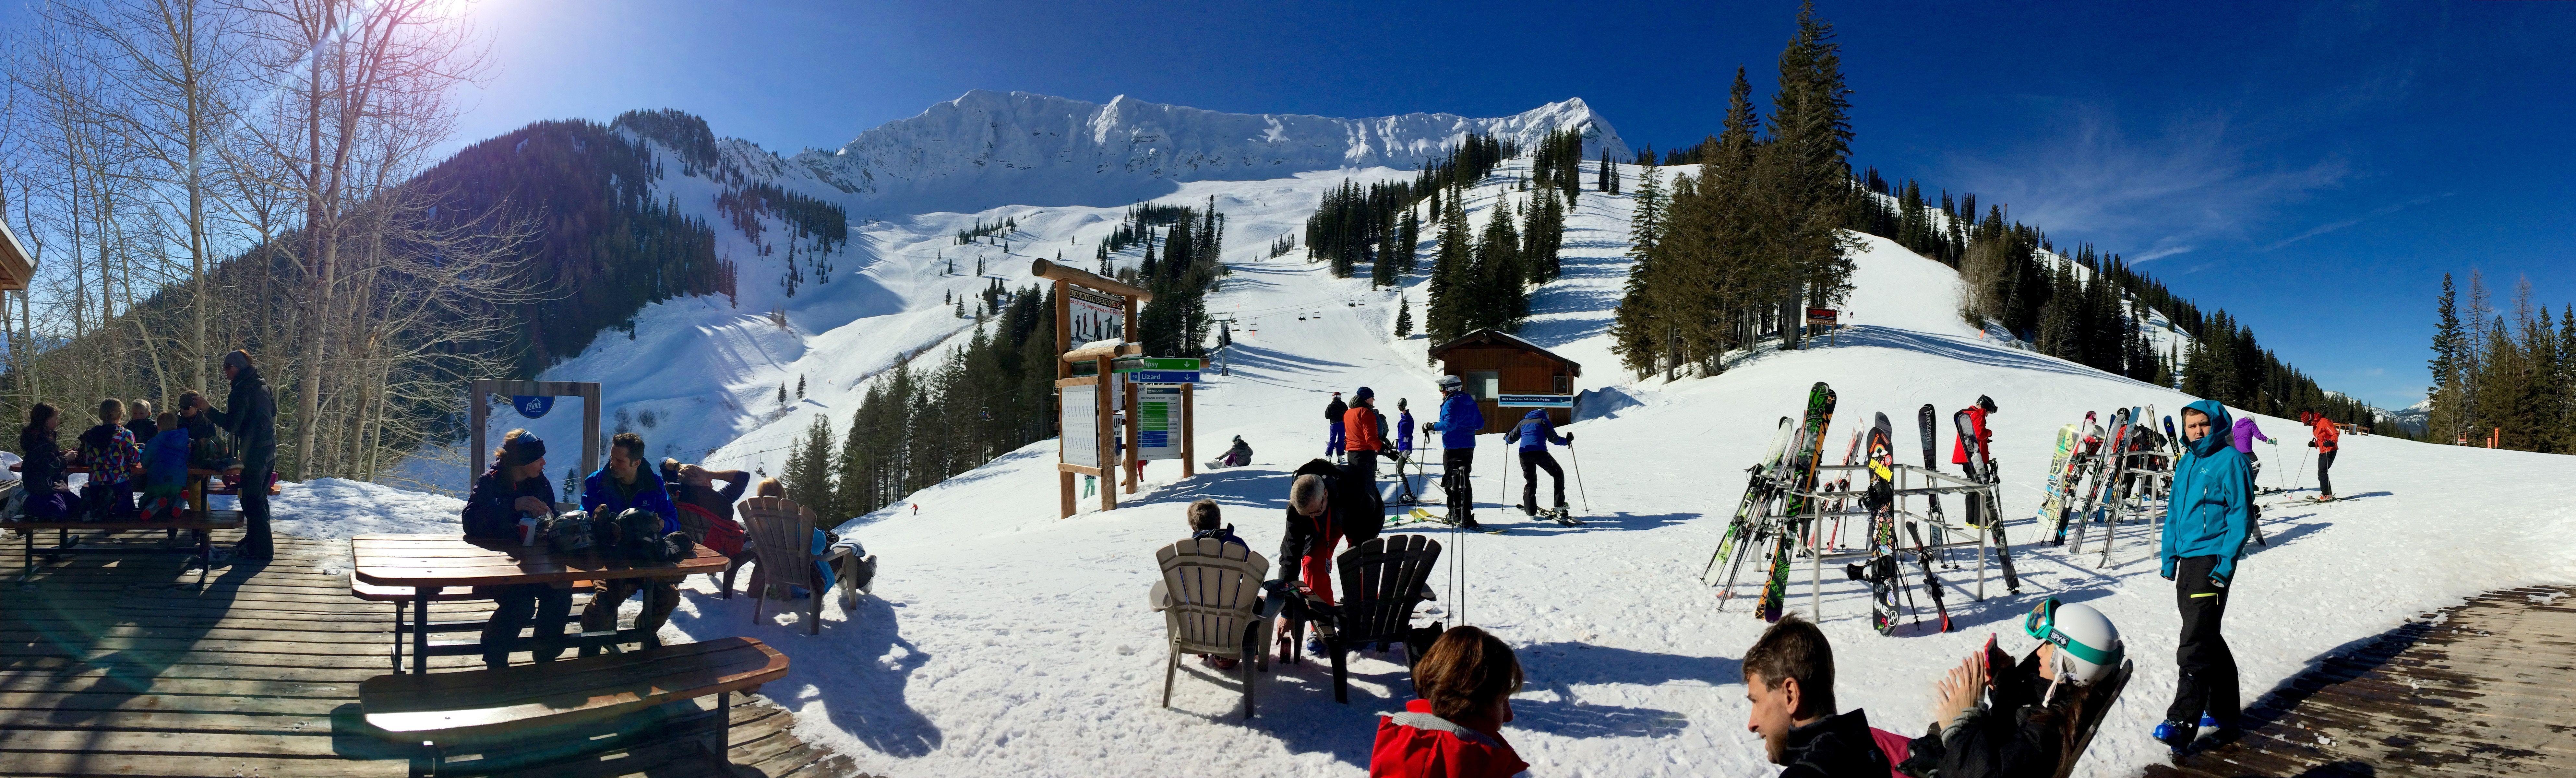 Open air lunch: Fernie, British Columbia